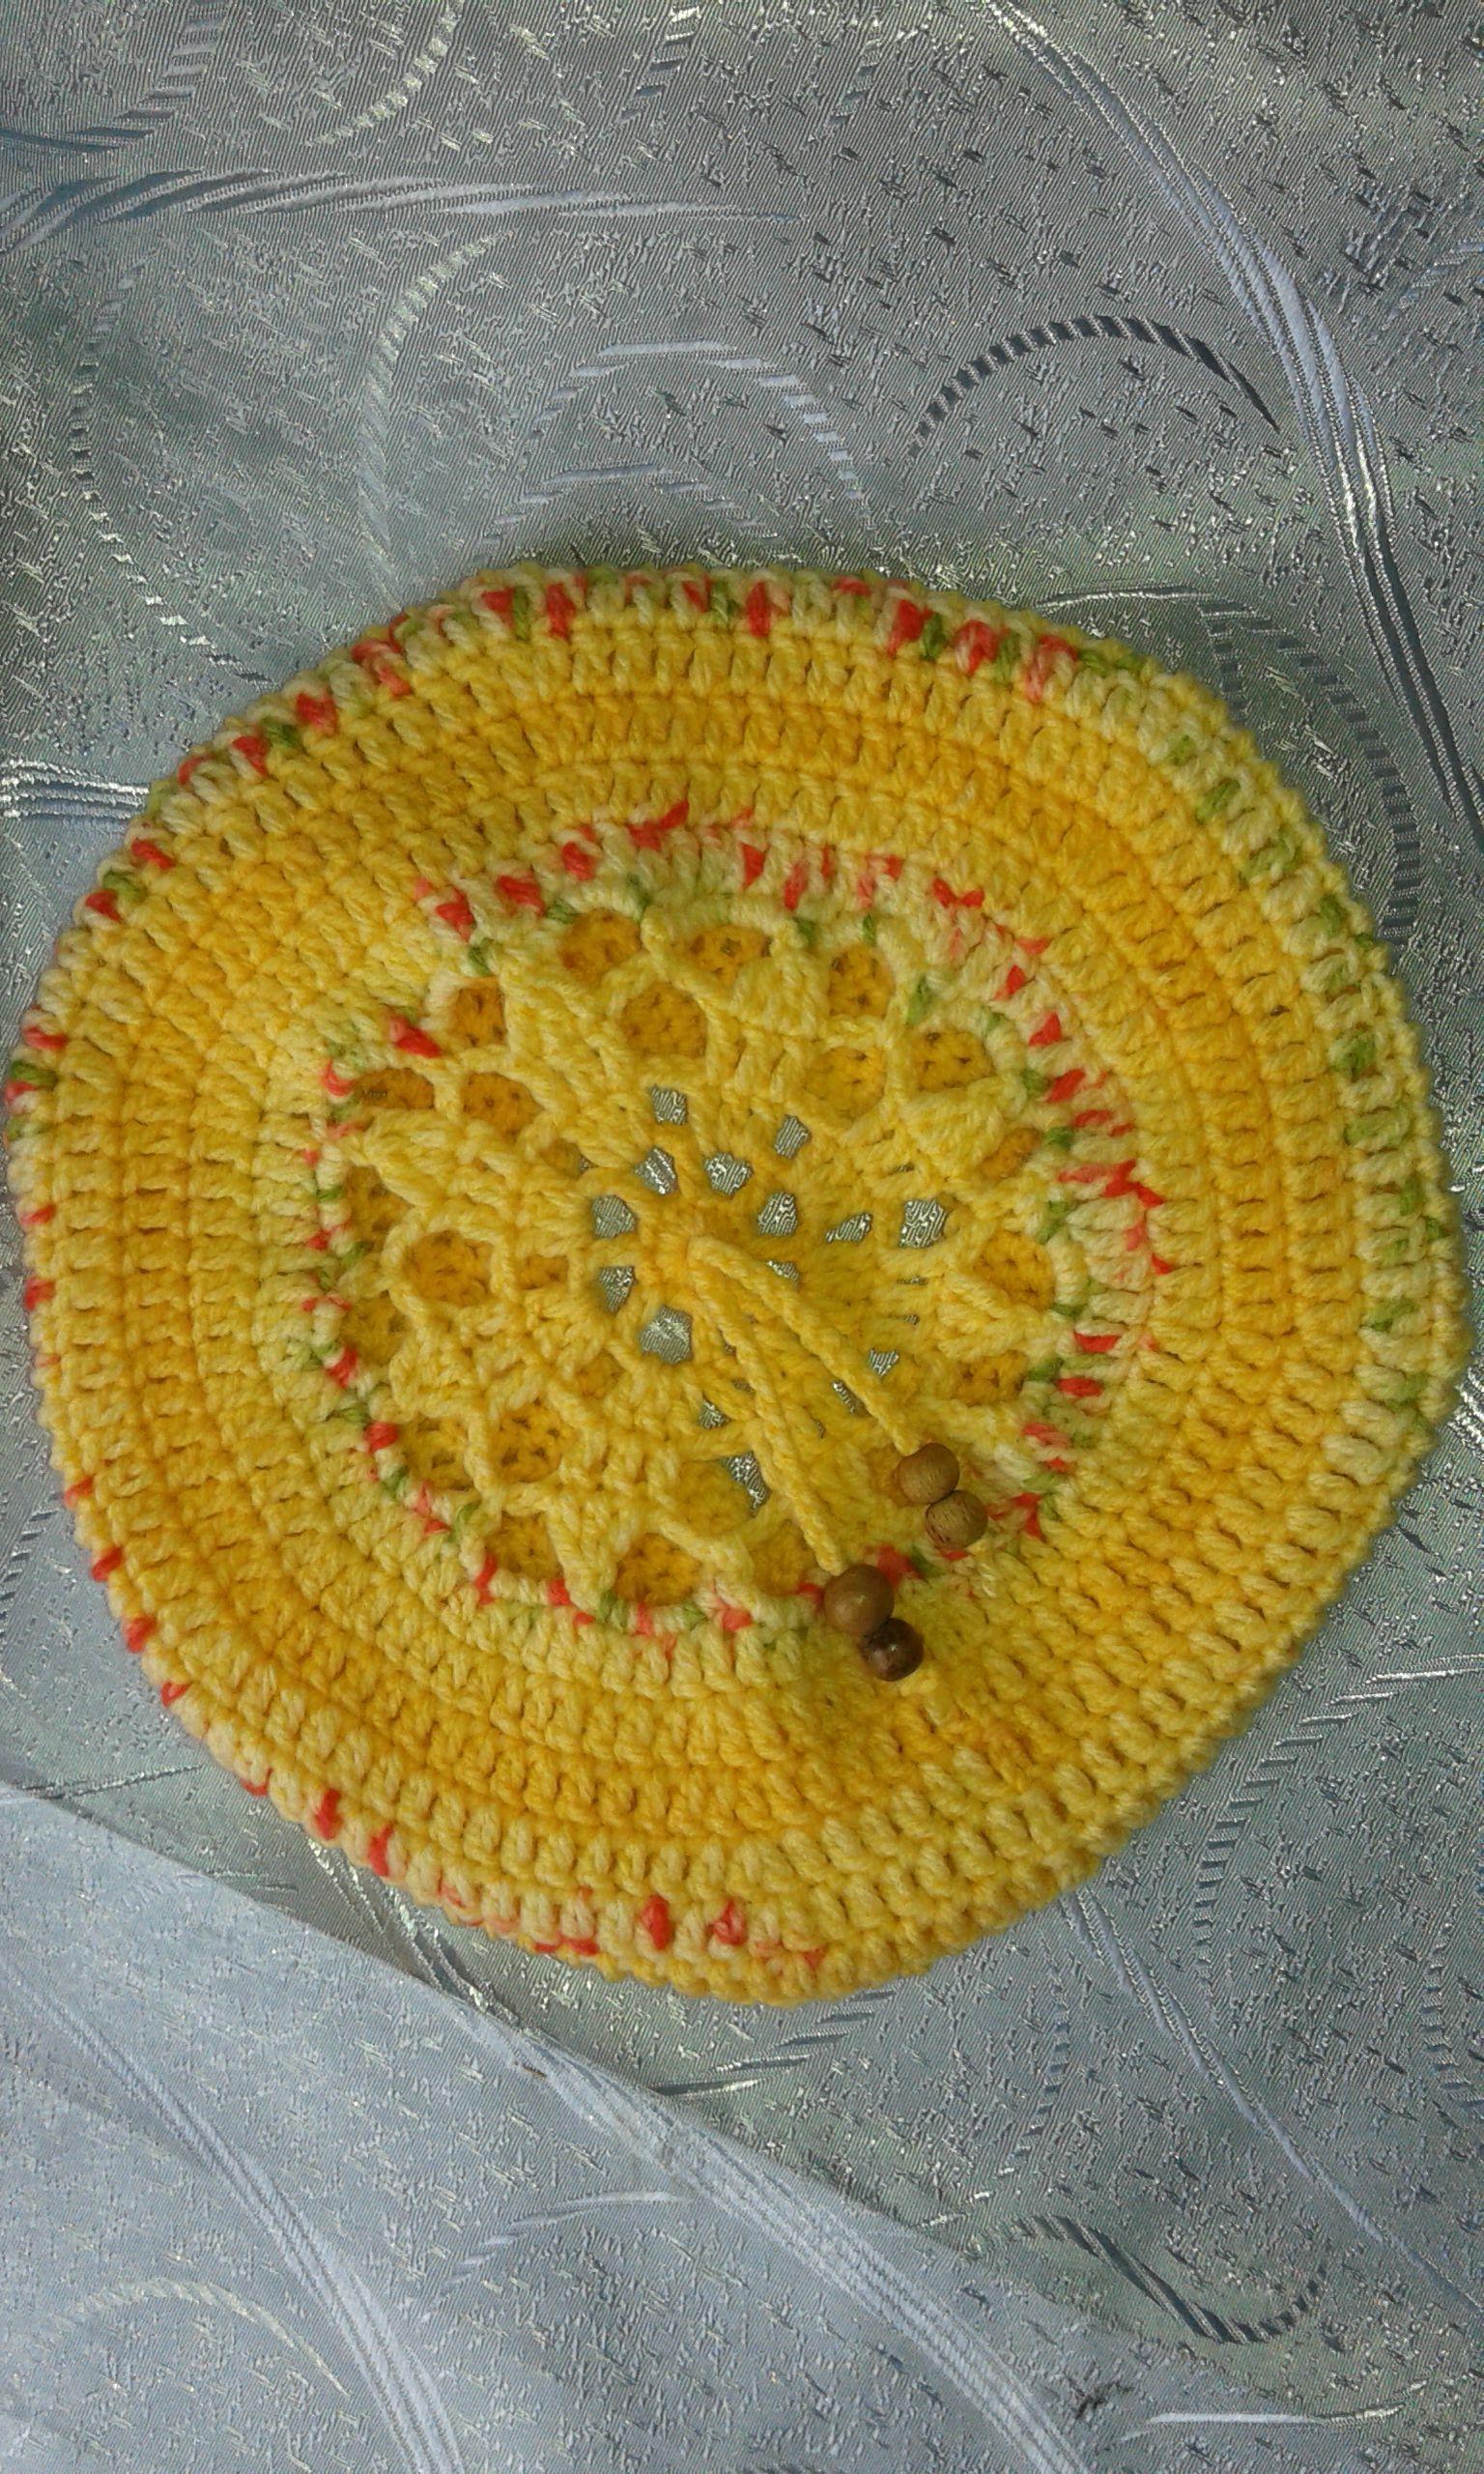 бусины уборы шапка желтый берет осень головные дети весна